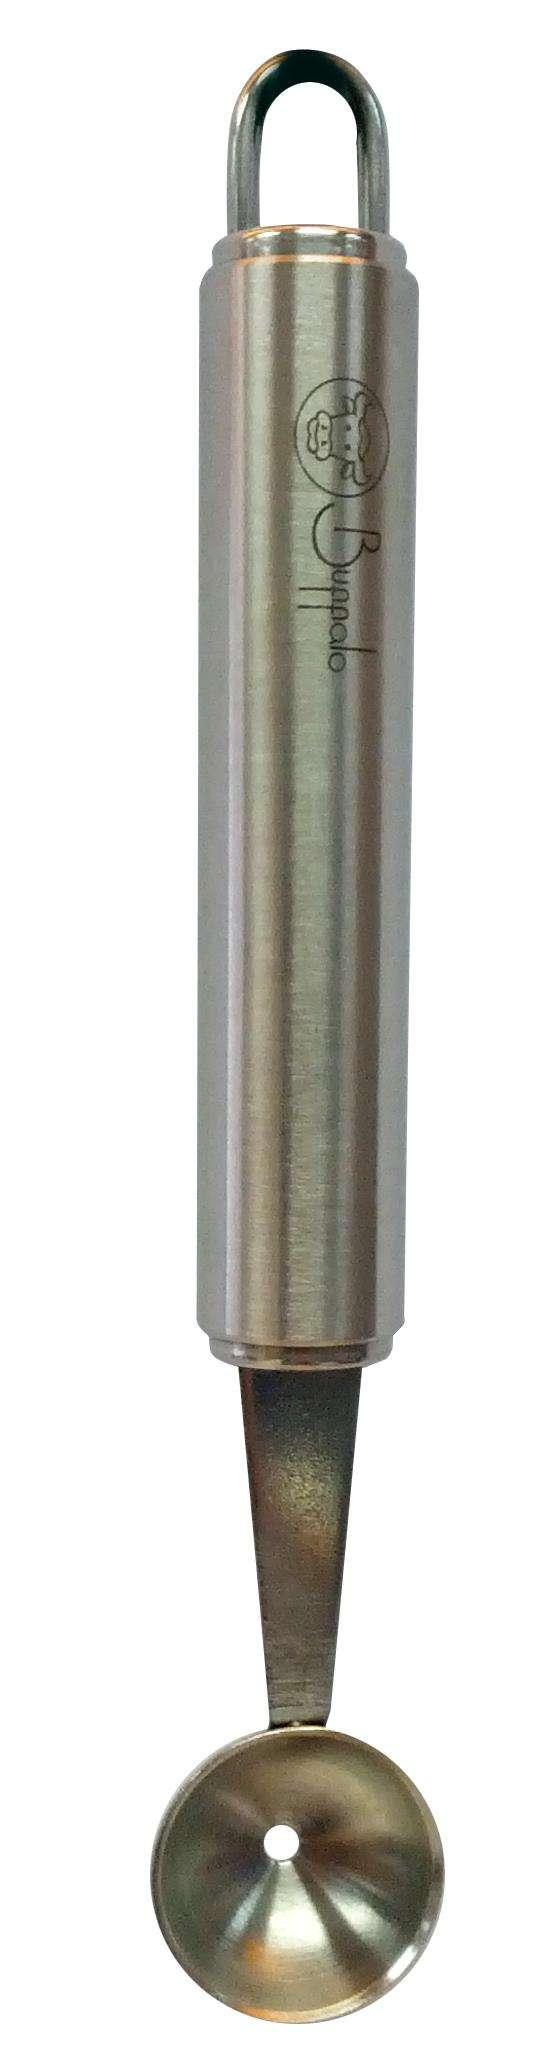 Elegant series 18/10 Stainless steel Kitchen Utensil Small Scoop (333611)